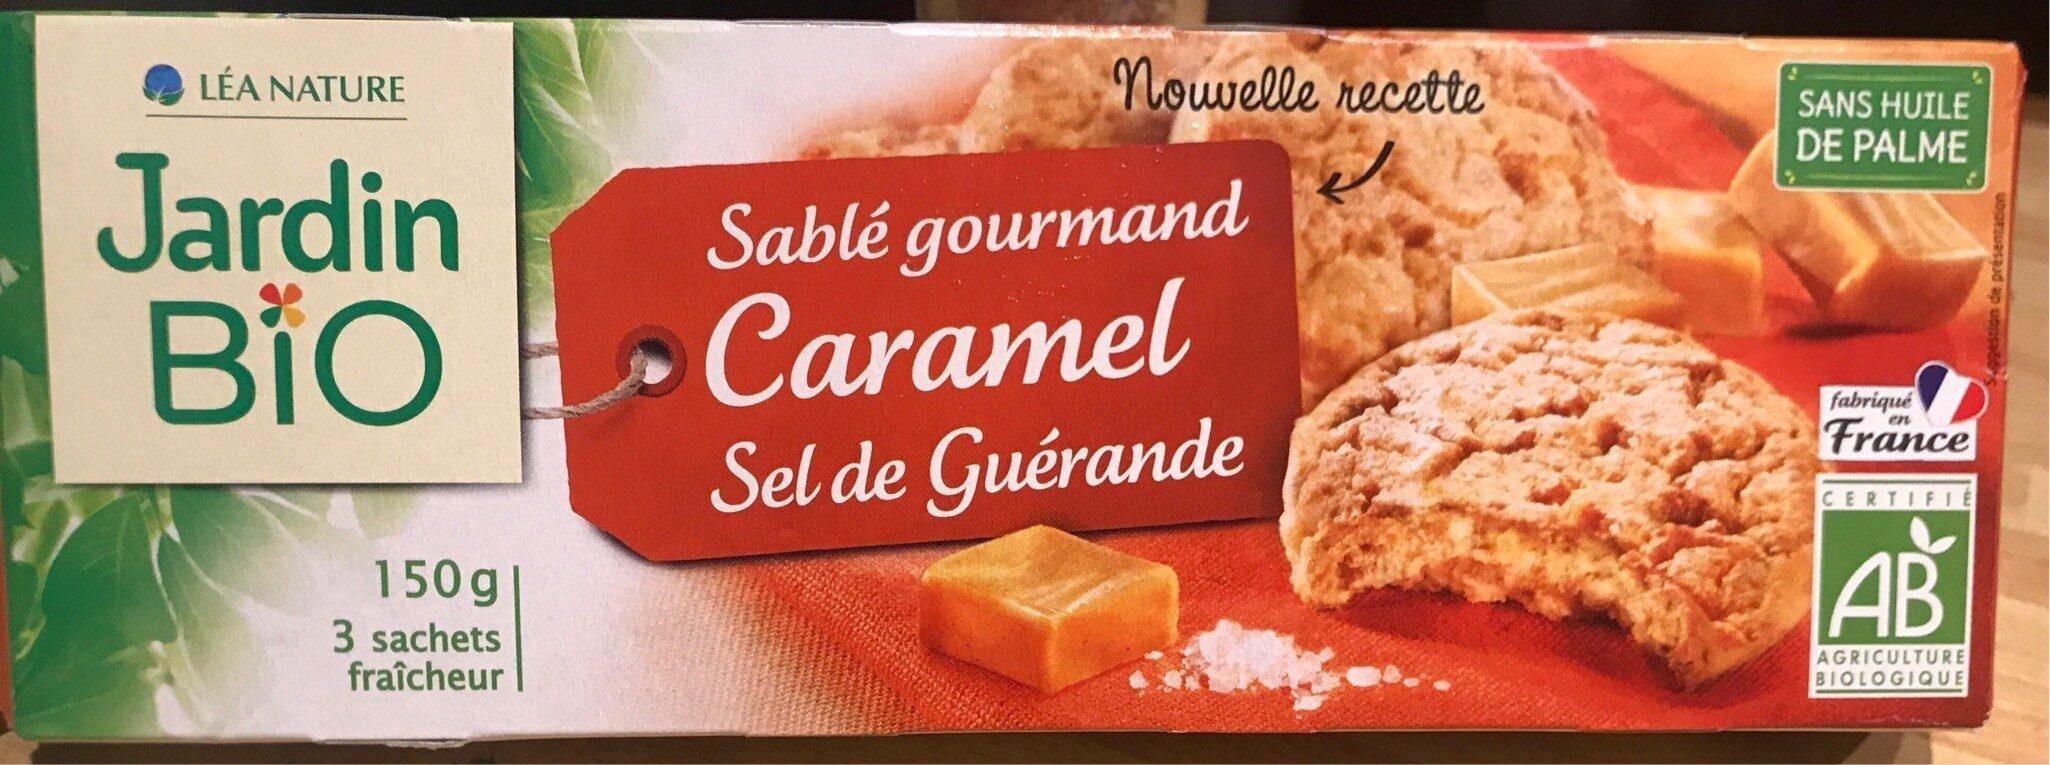 Sablé gourmand caramel sel de Guérande - Product